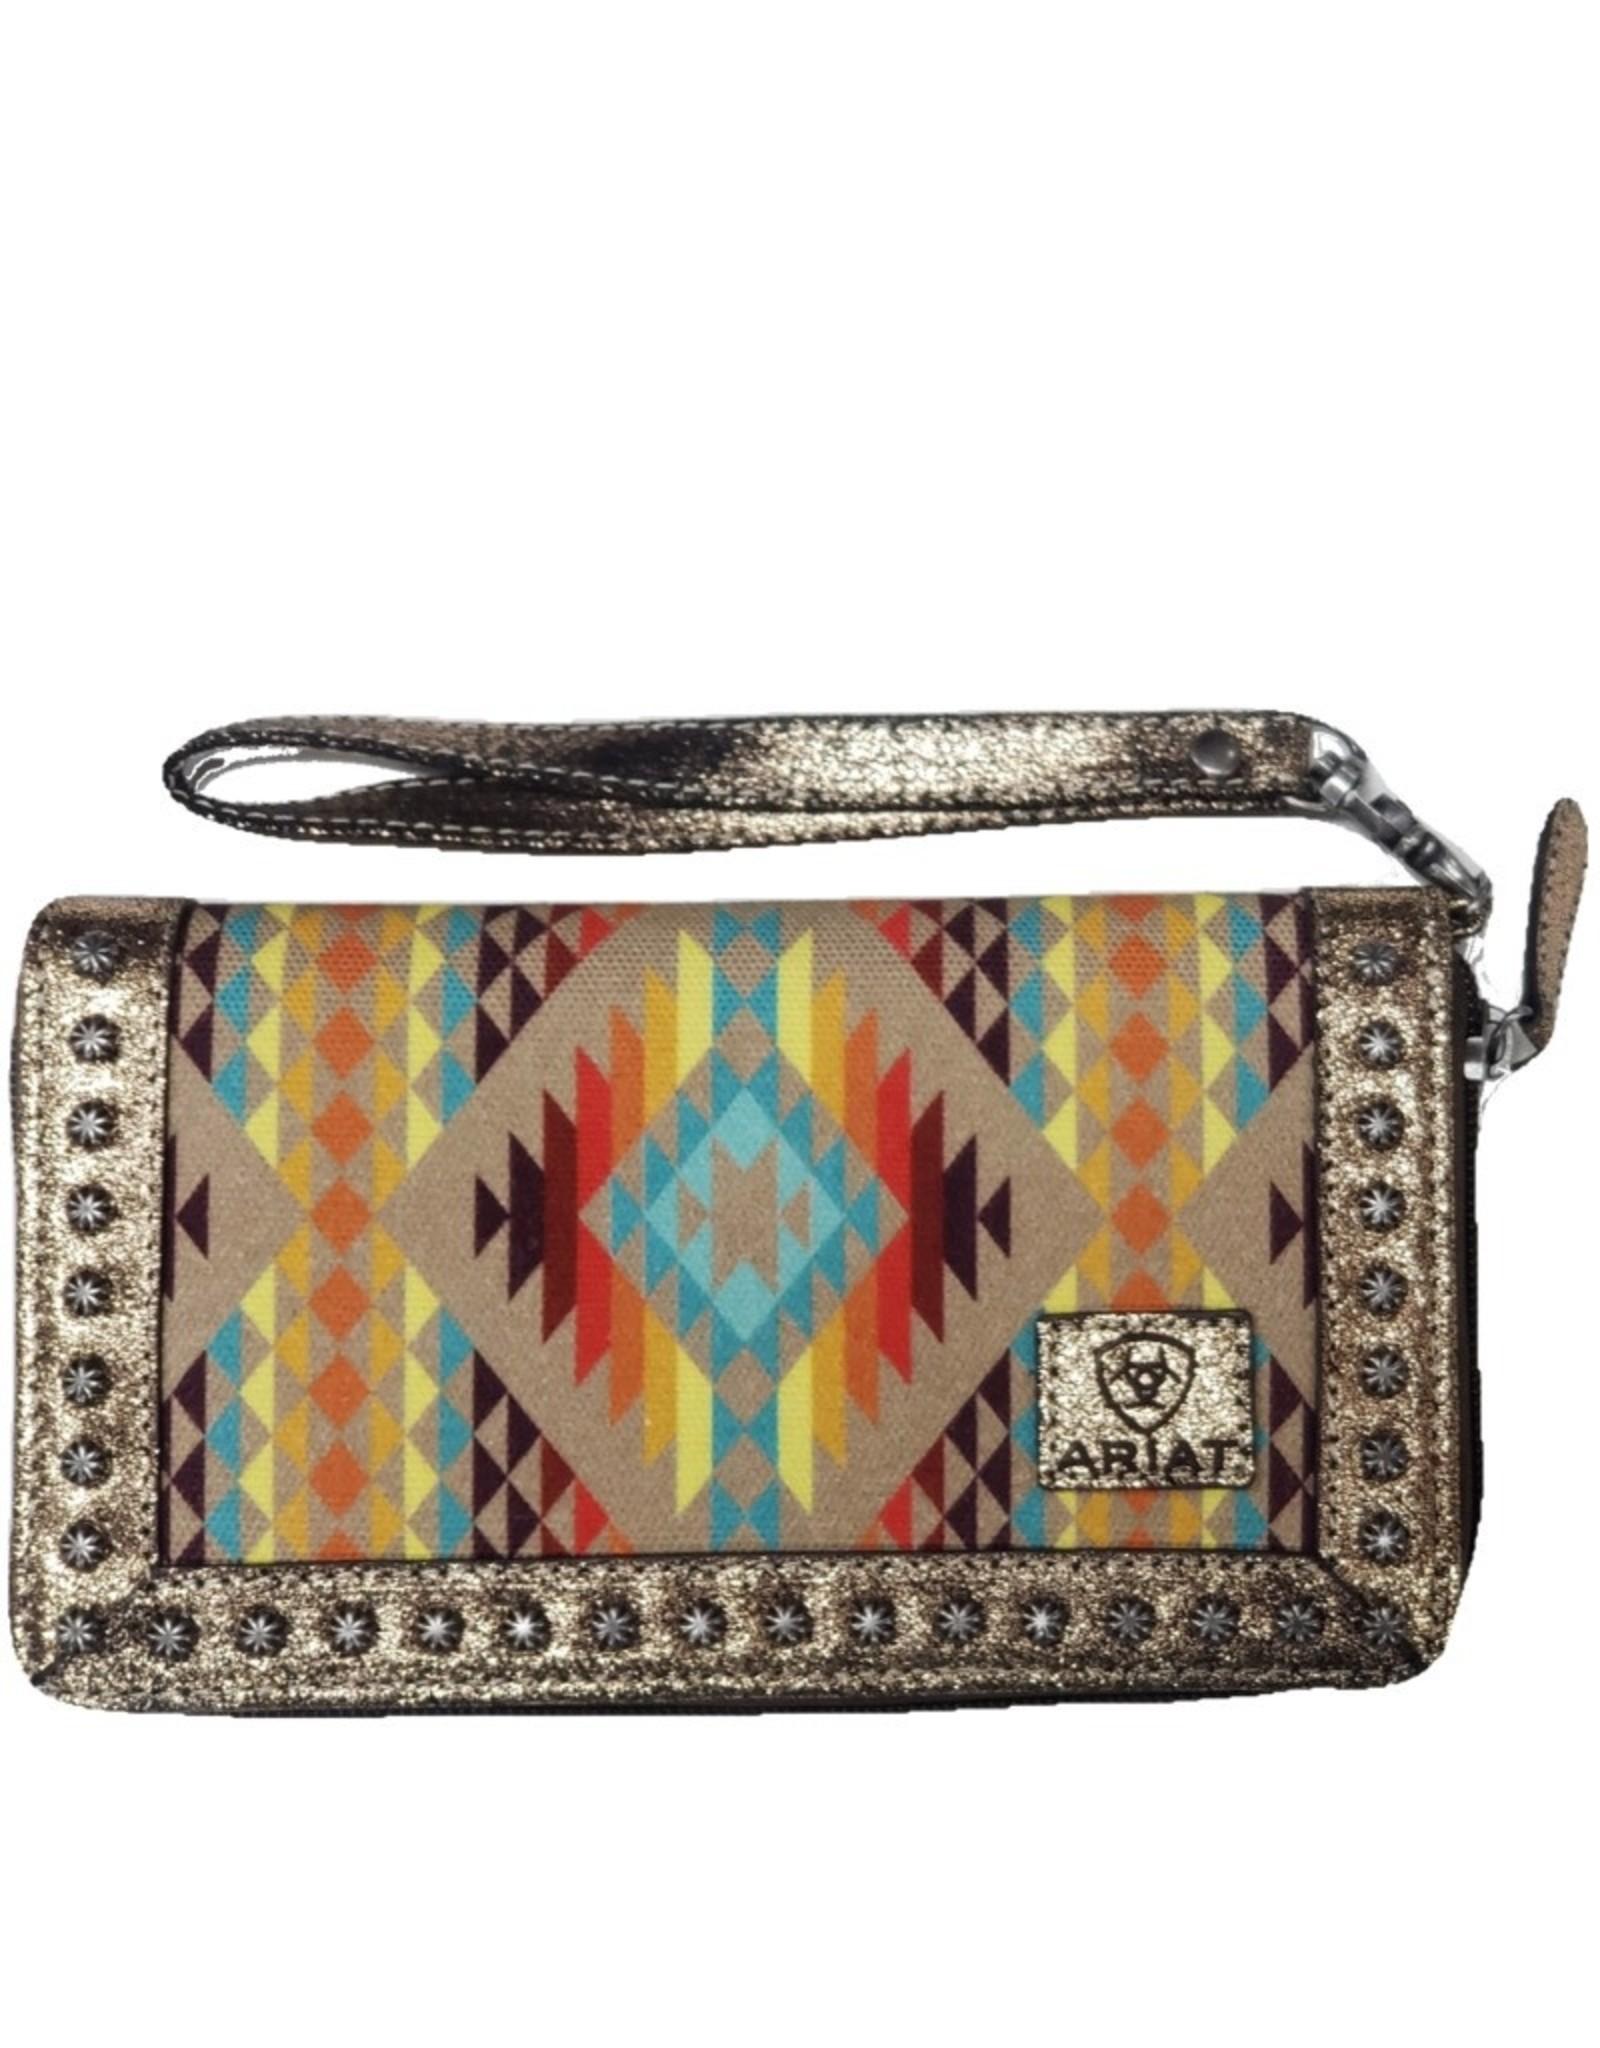 Ariat Ariat Matching Cruiser Wallet Tan Southwest Aztec Print